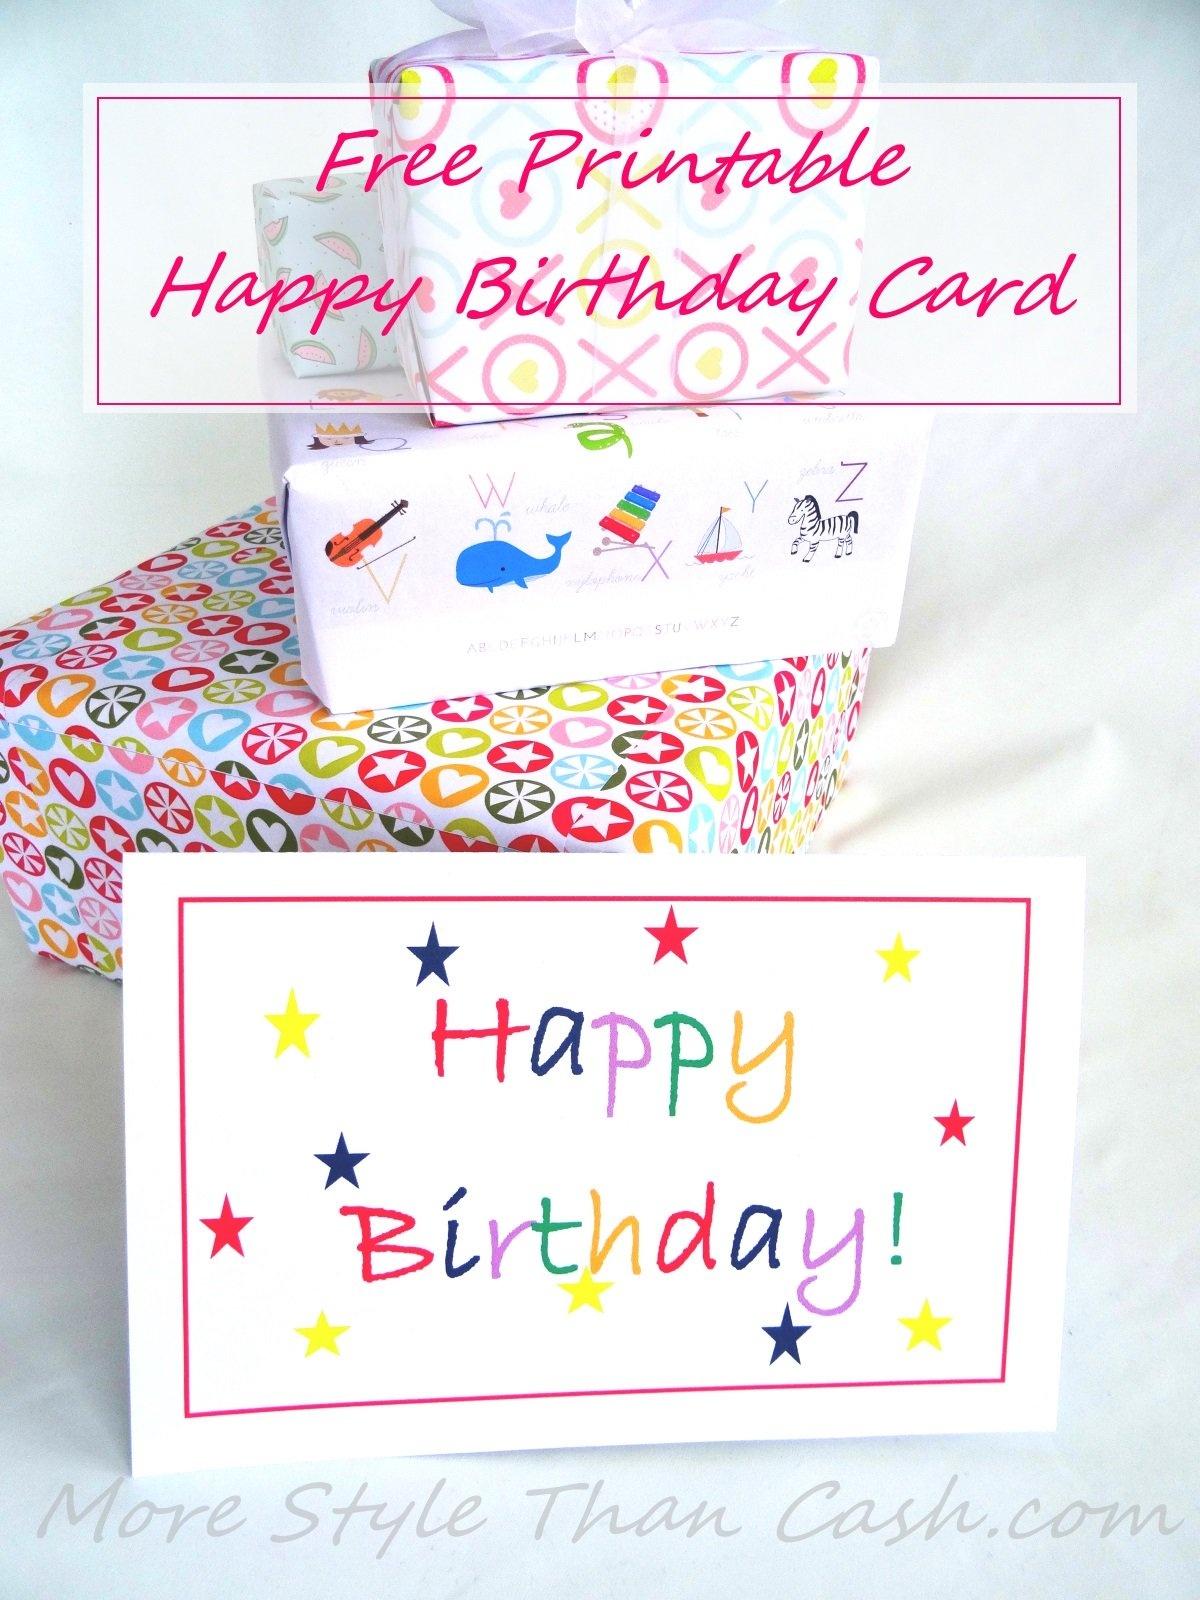 Free Printable Birthday Card - Happy Birthday Free Cards Printable